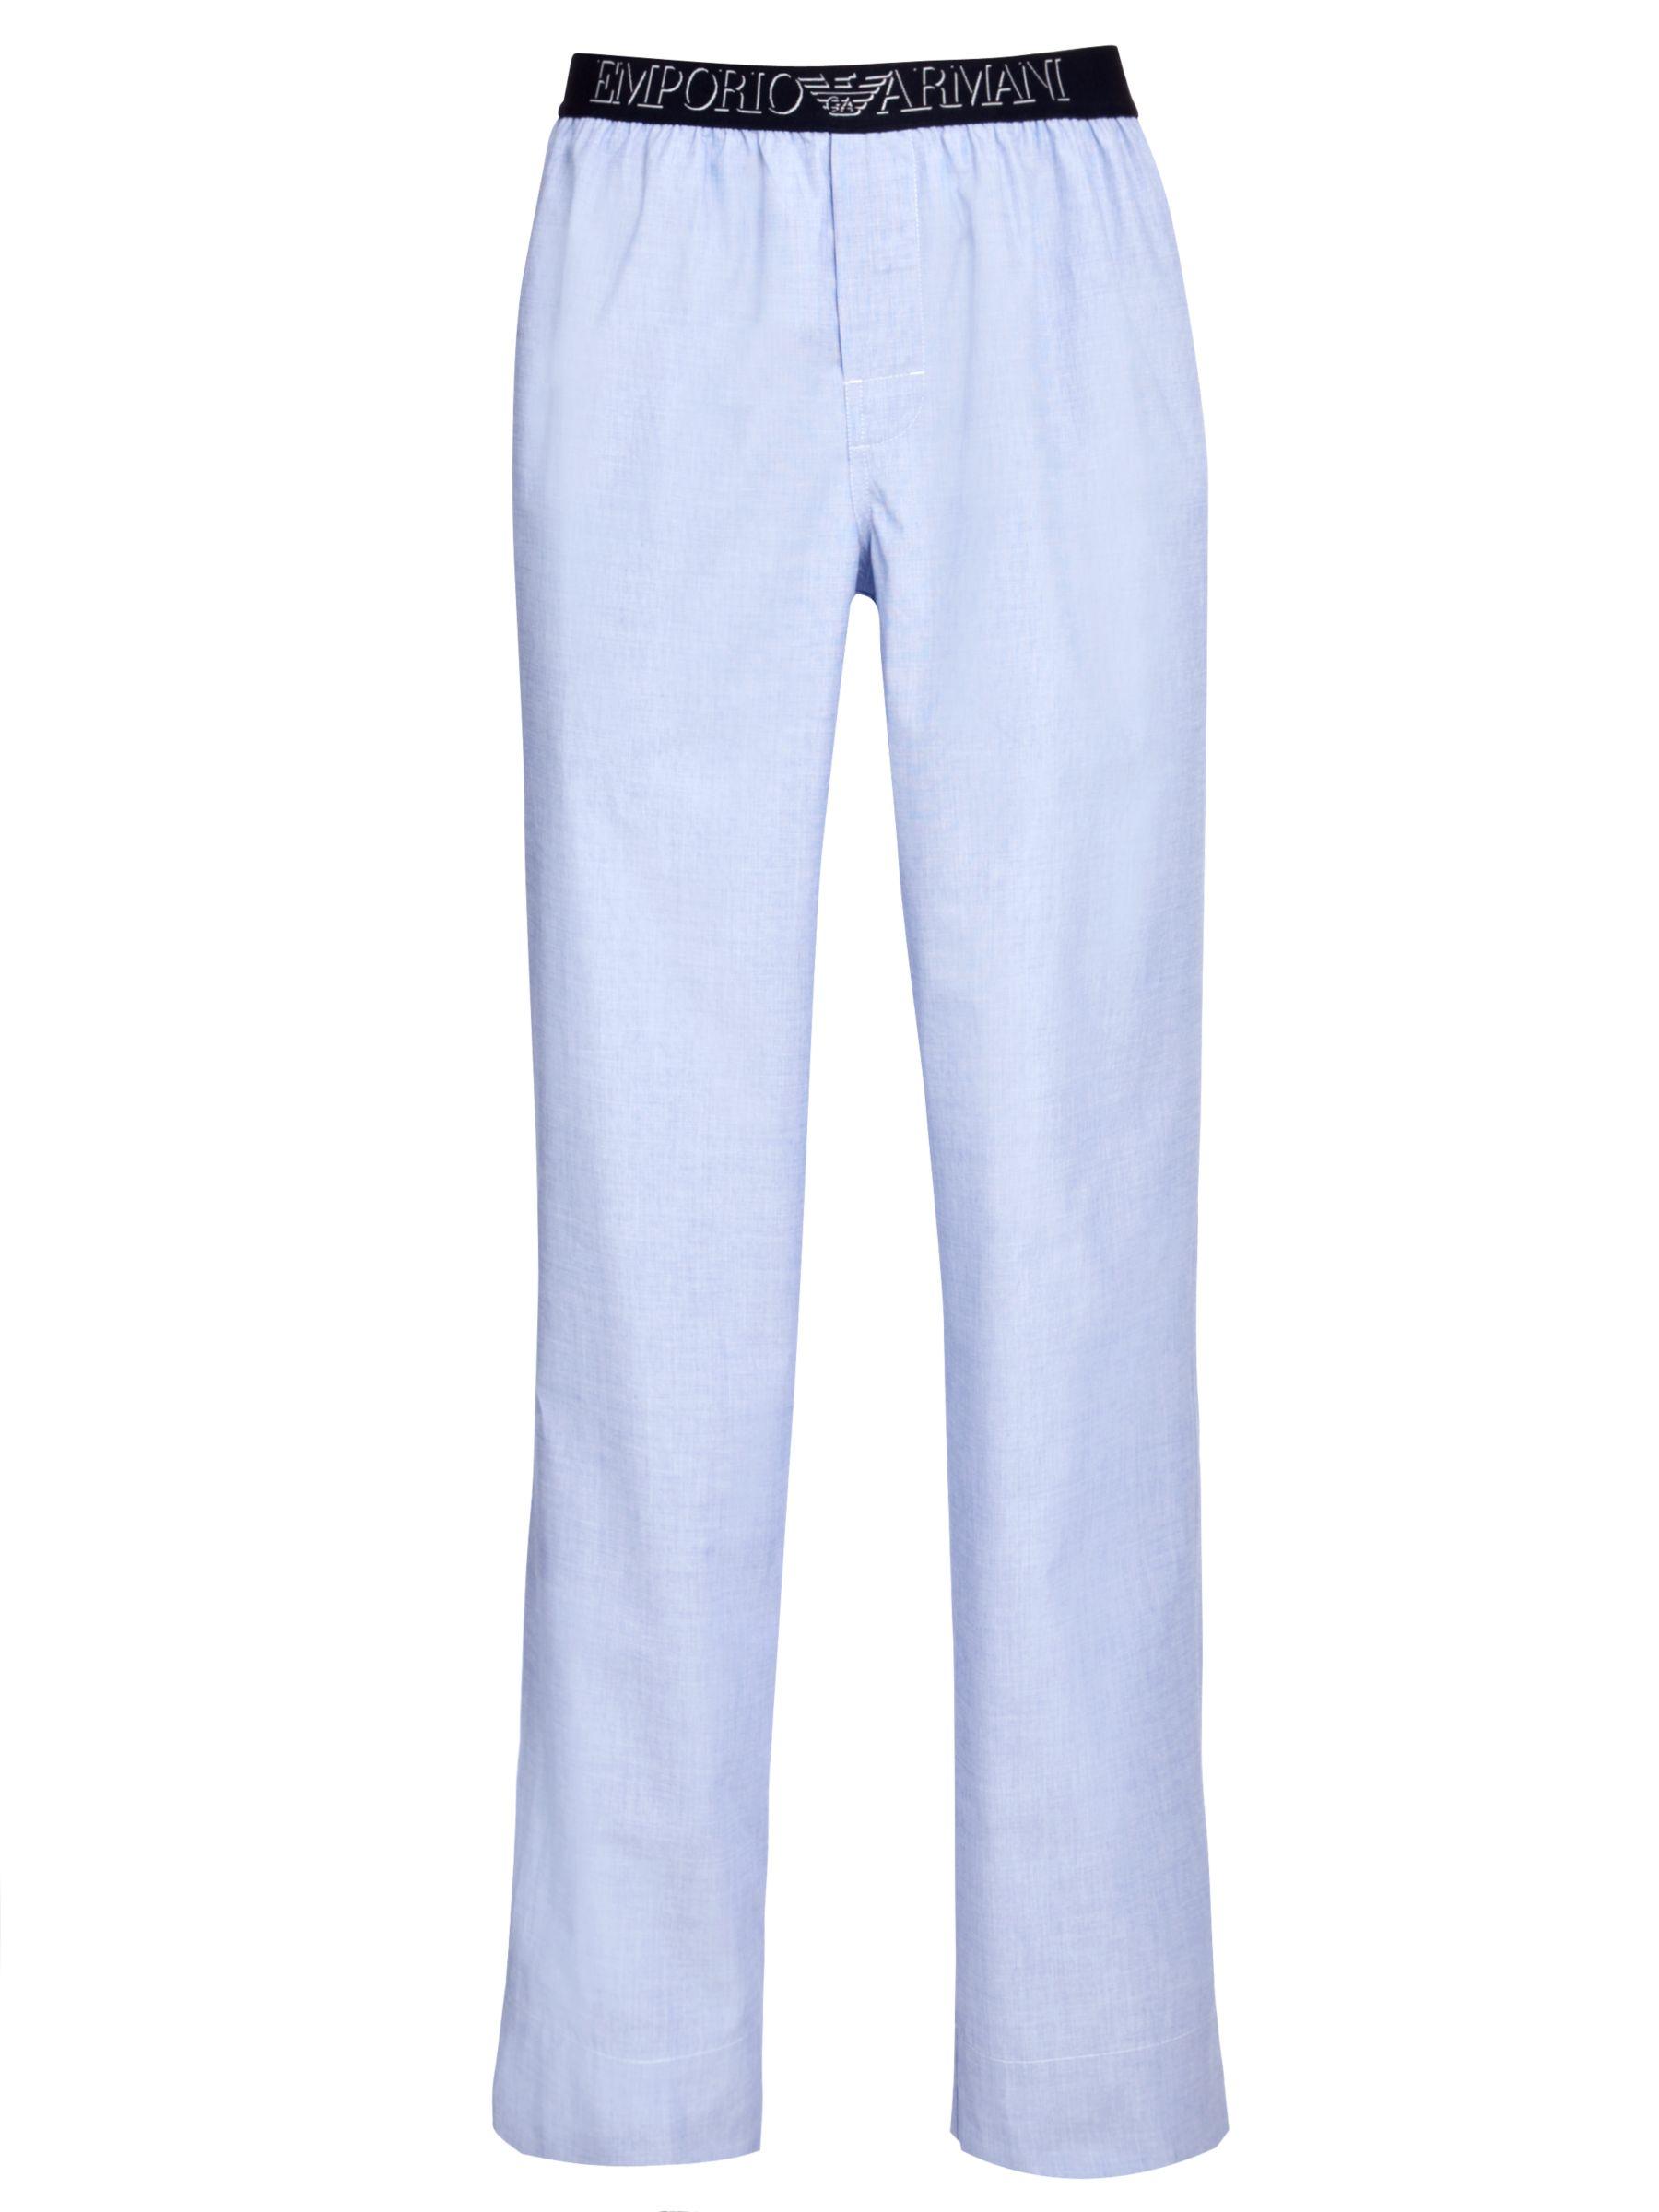 Emporio Armani Woven Lounge Pants, Blue